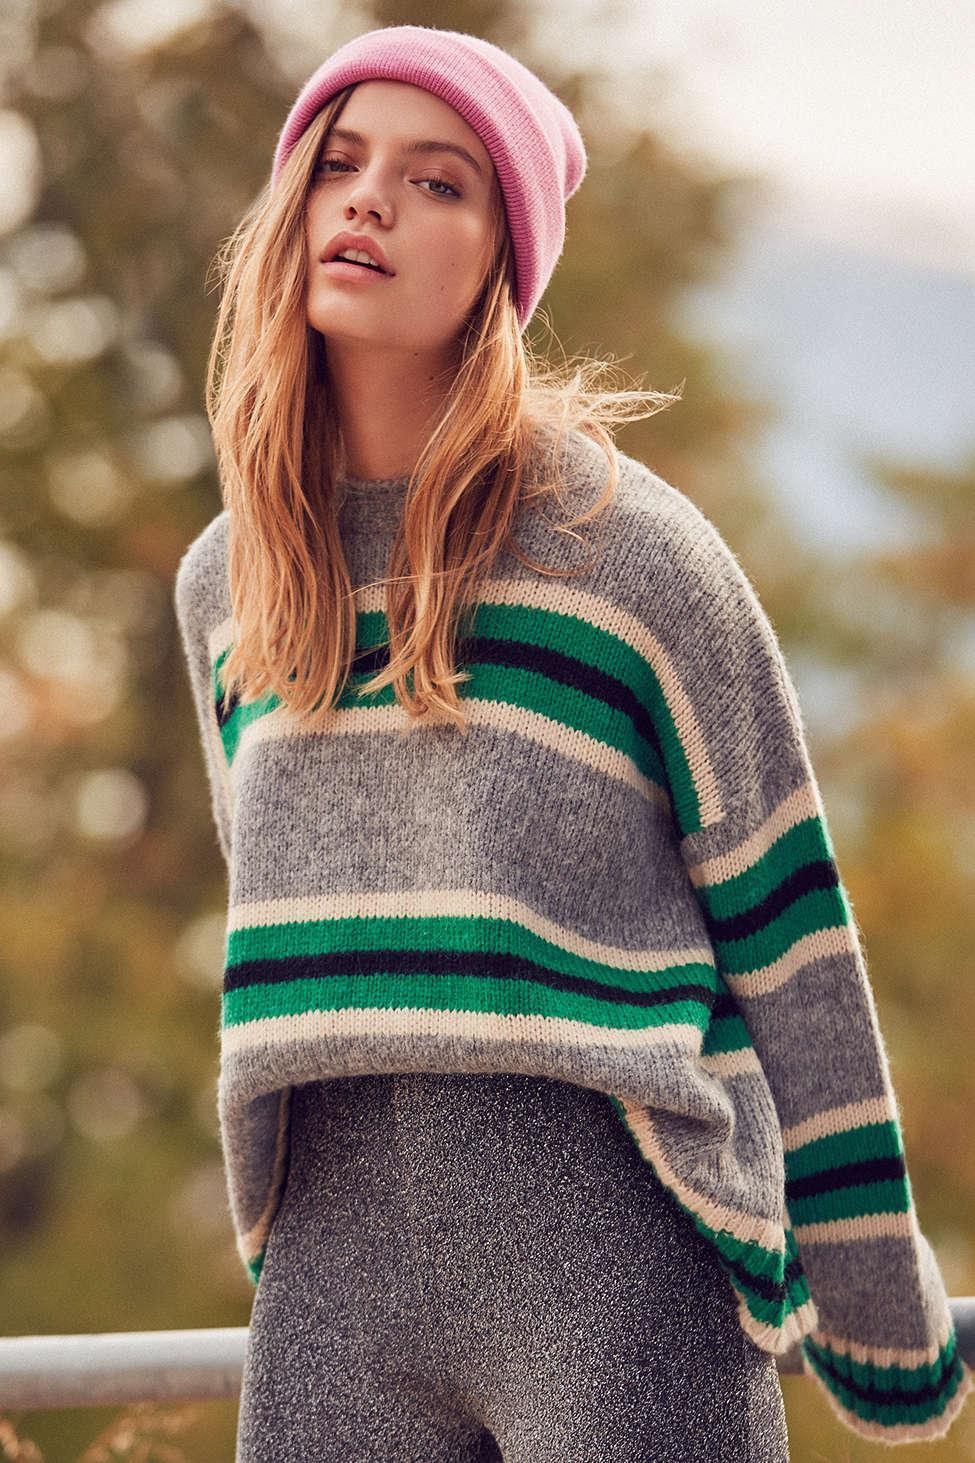 f39a09ee0b Urban Outfitters Uo Oversized Striped Boyfriend Sweater in Gray - Lyst